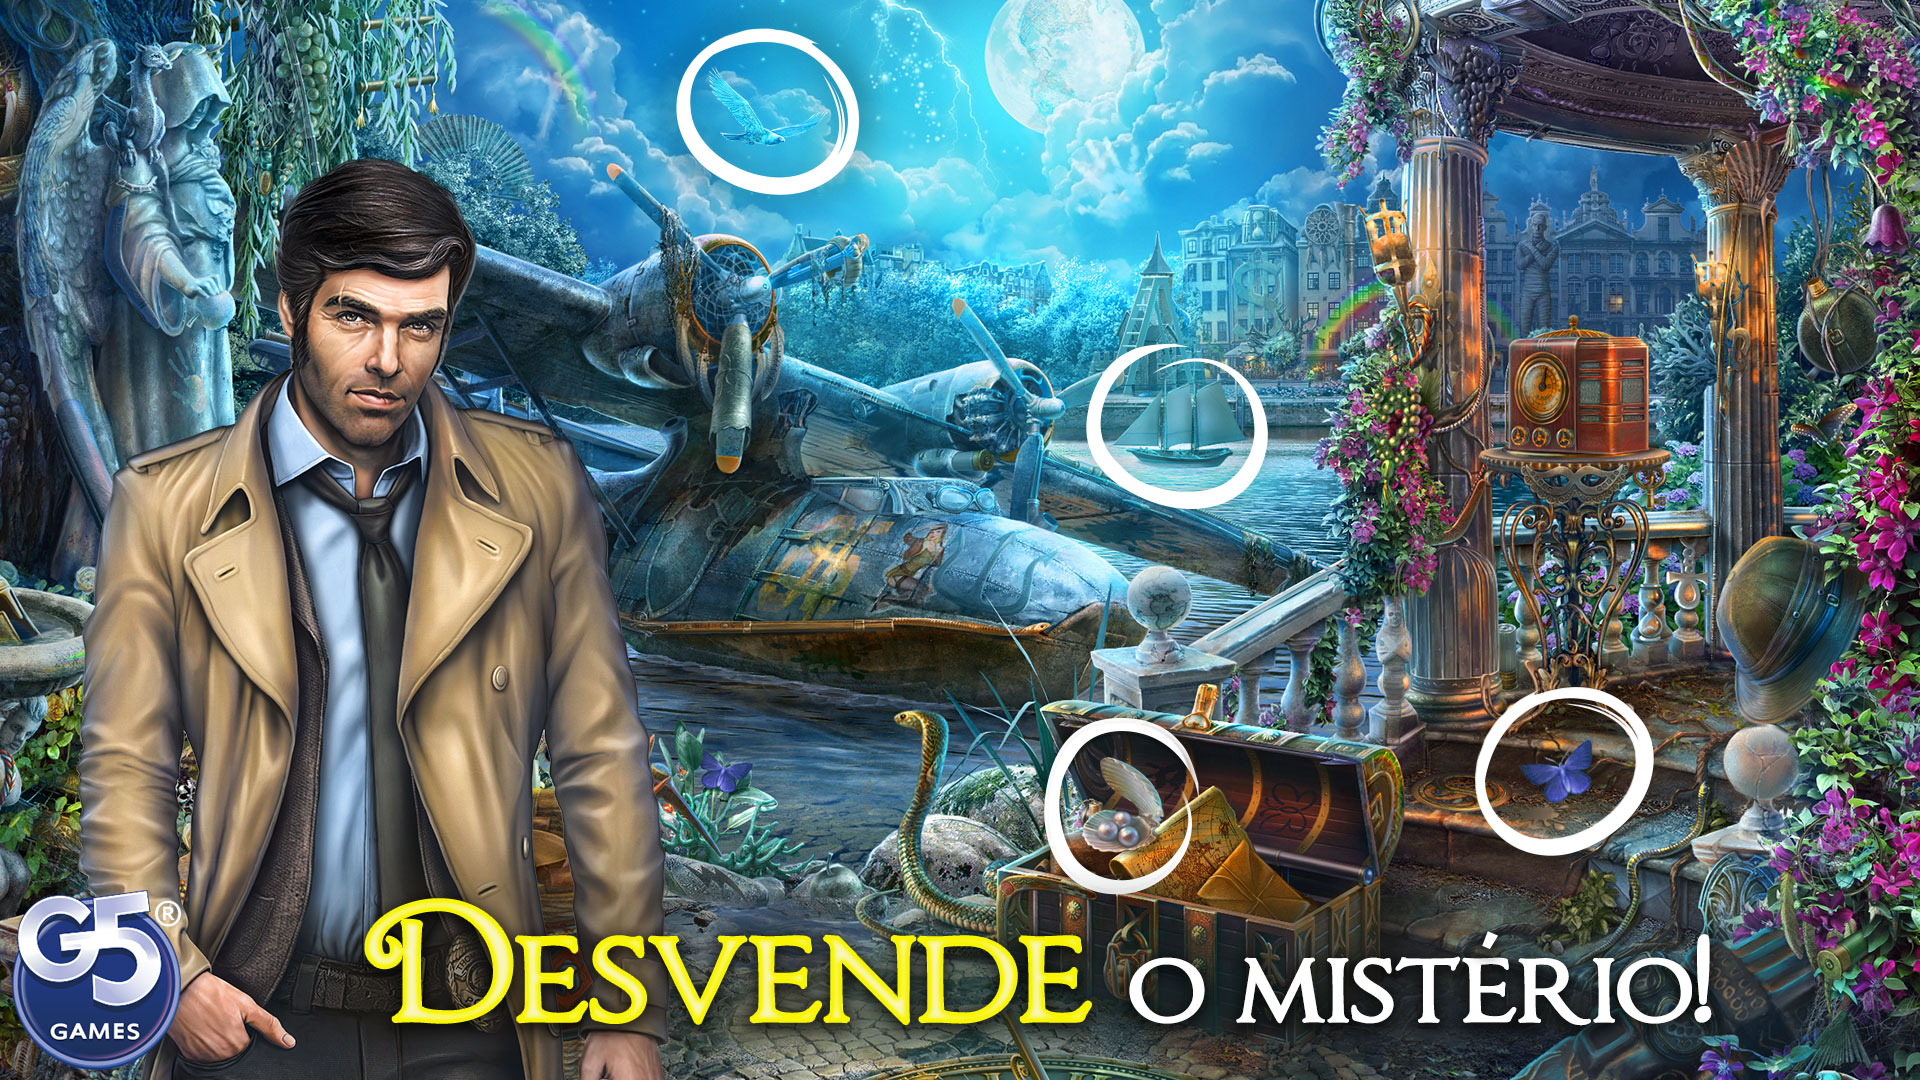 Hidden City: Aventura de Objetos Ocultos: Amazon.com.br